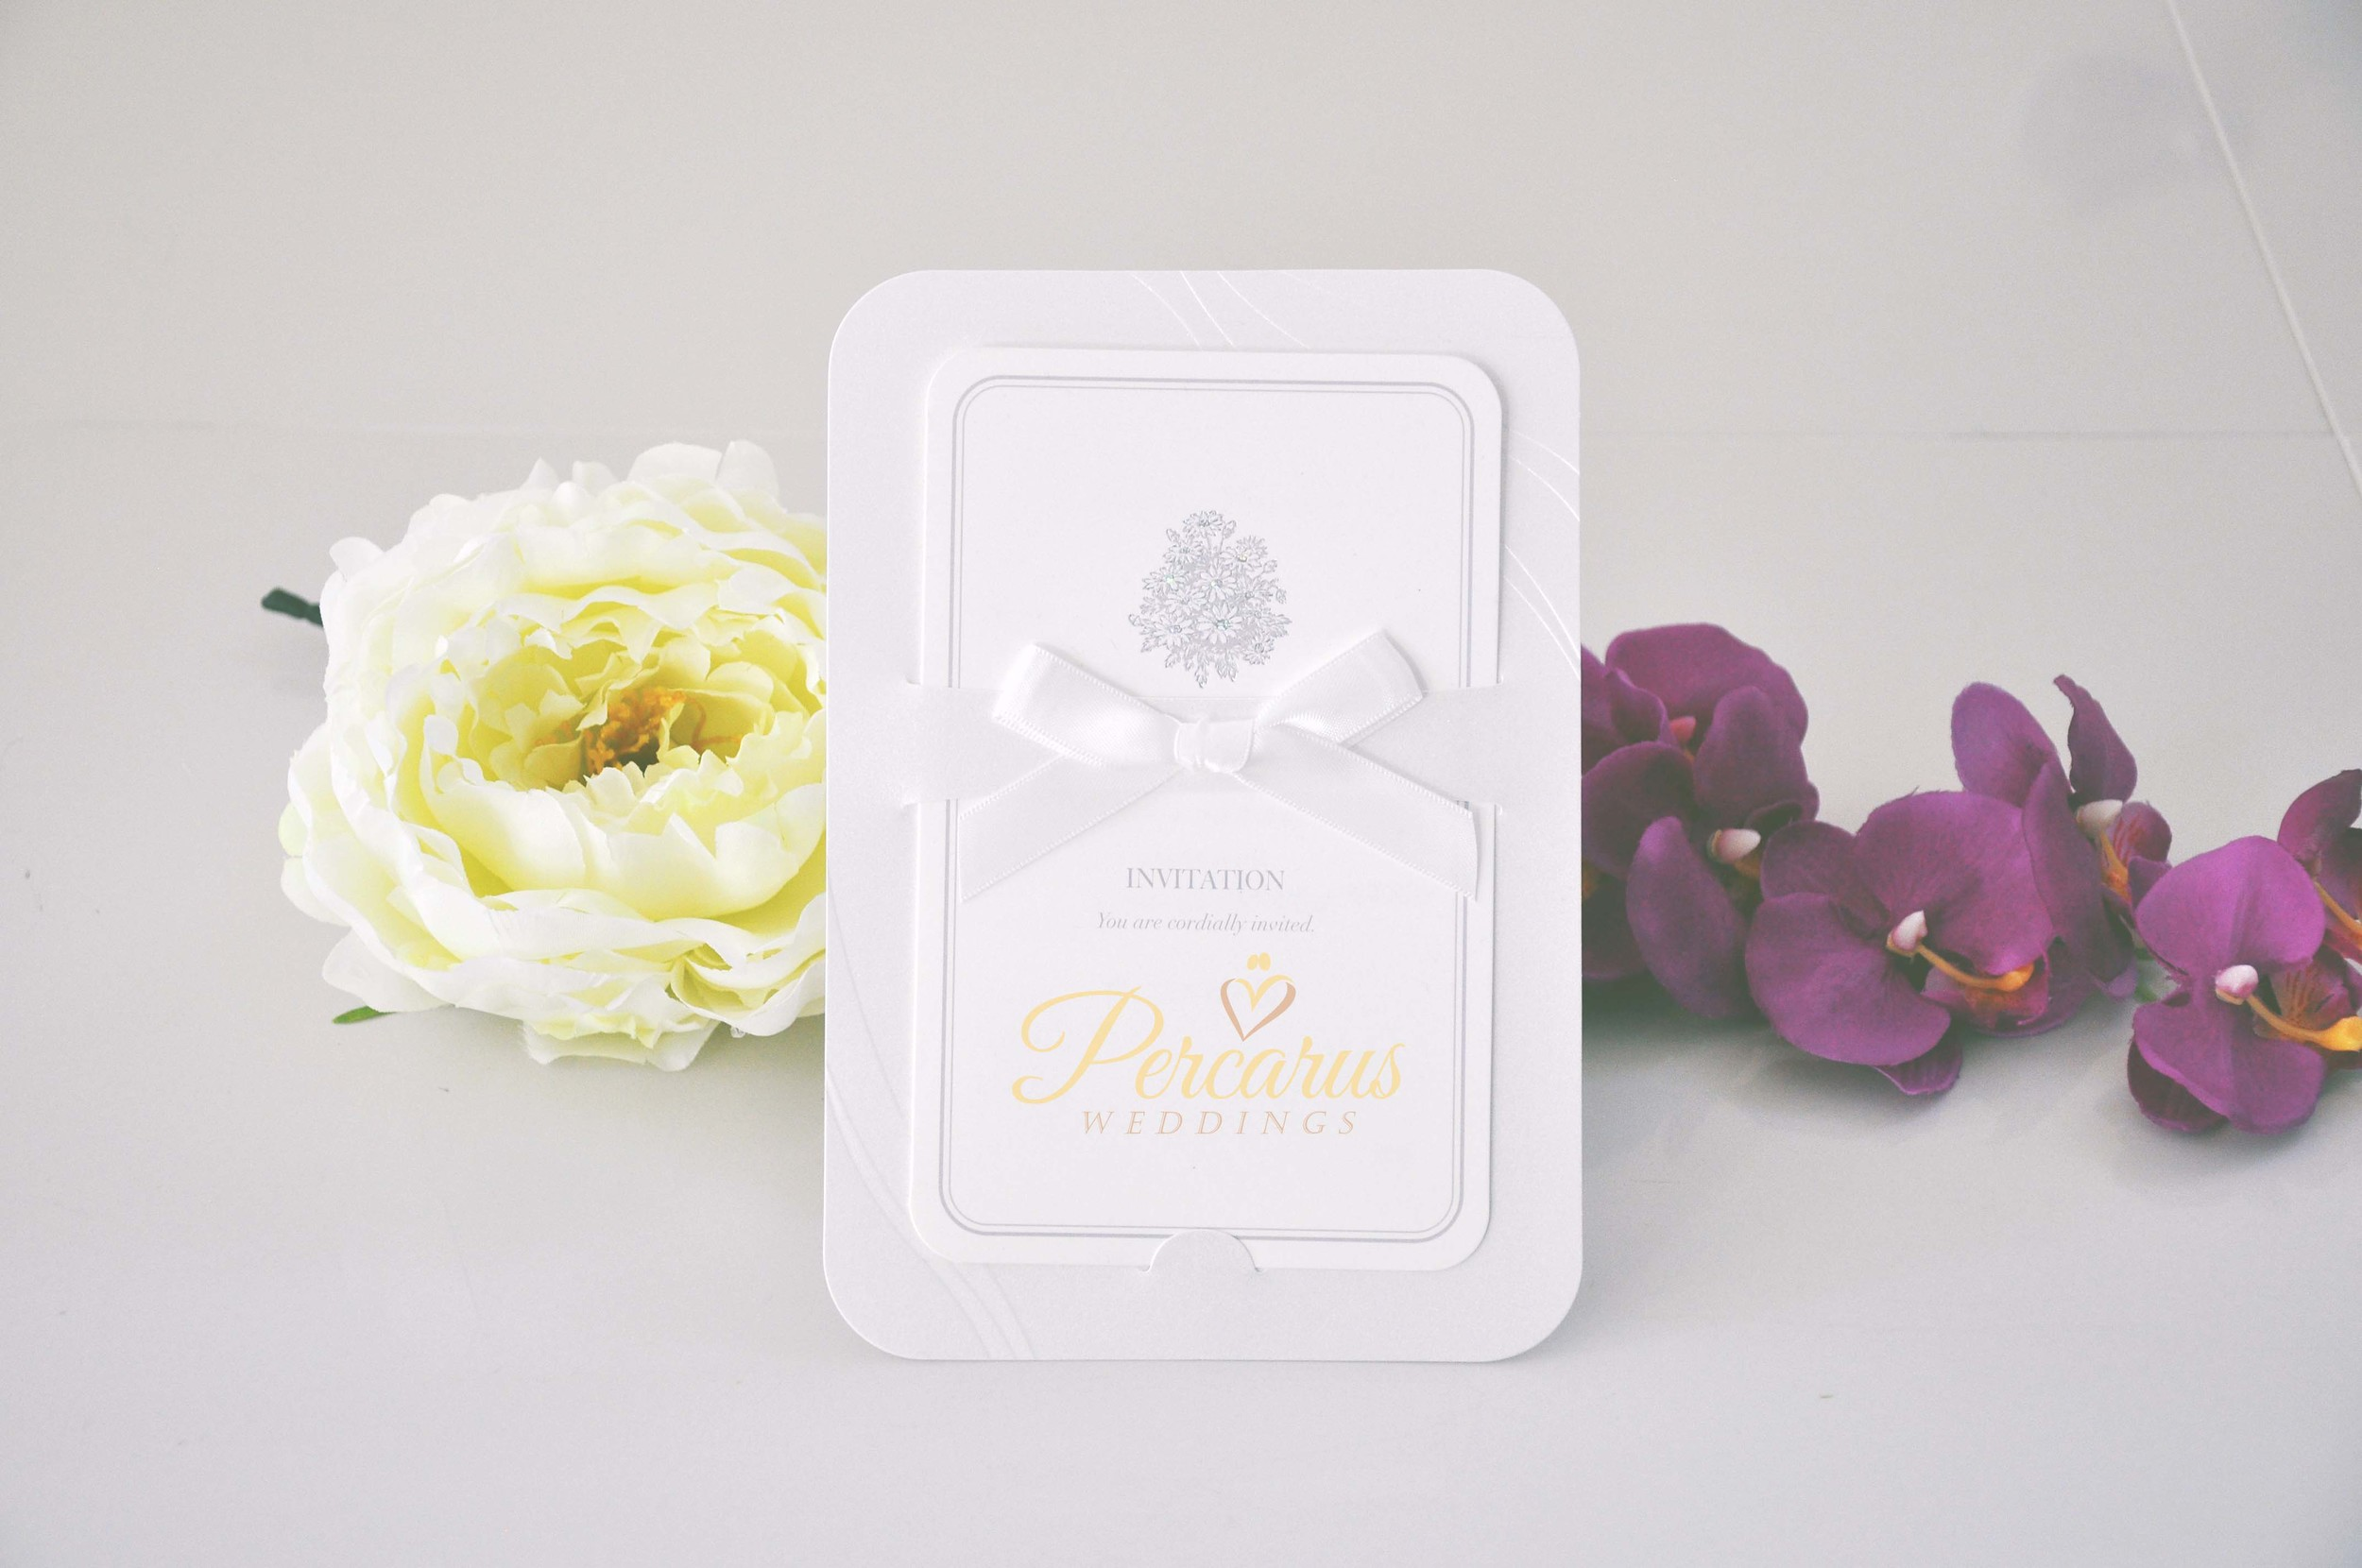 classic-white-card-insert-invitation-with-ribbon